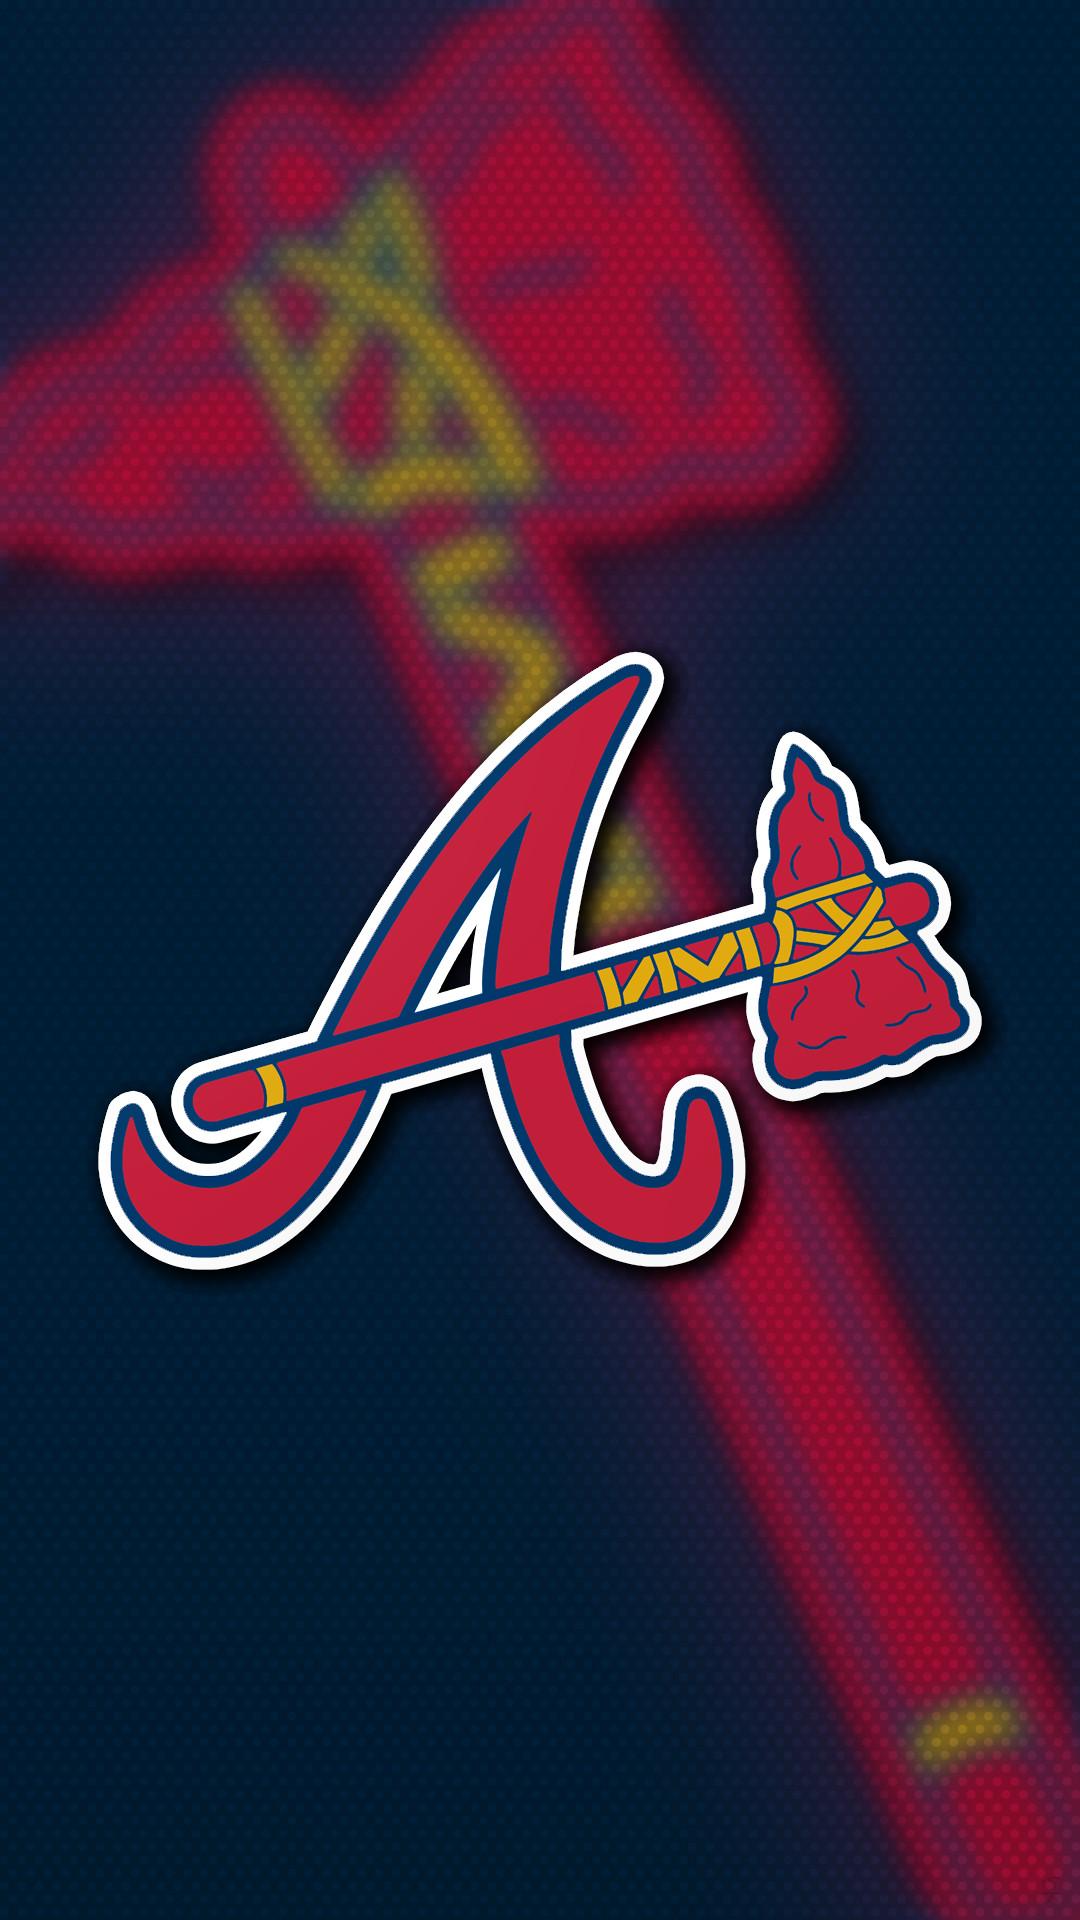 Atlanta Braves Tomahawk 01 Data Src Gorgerous Atlanta Atlanta Braves Wallpaper Iphone 1080x1920 Download Hd Wallpaper Wallpapertip